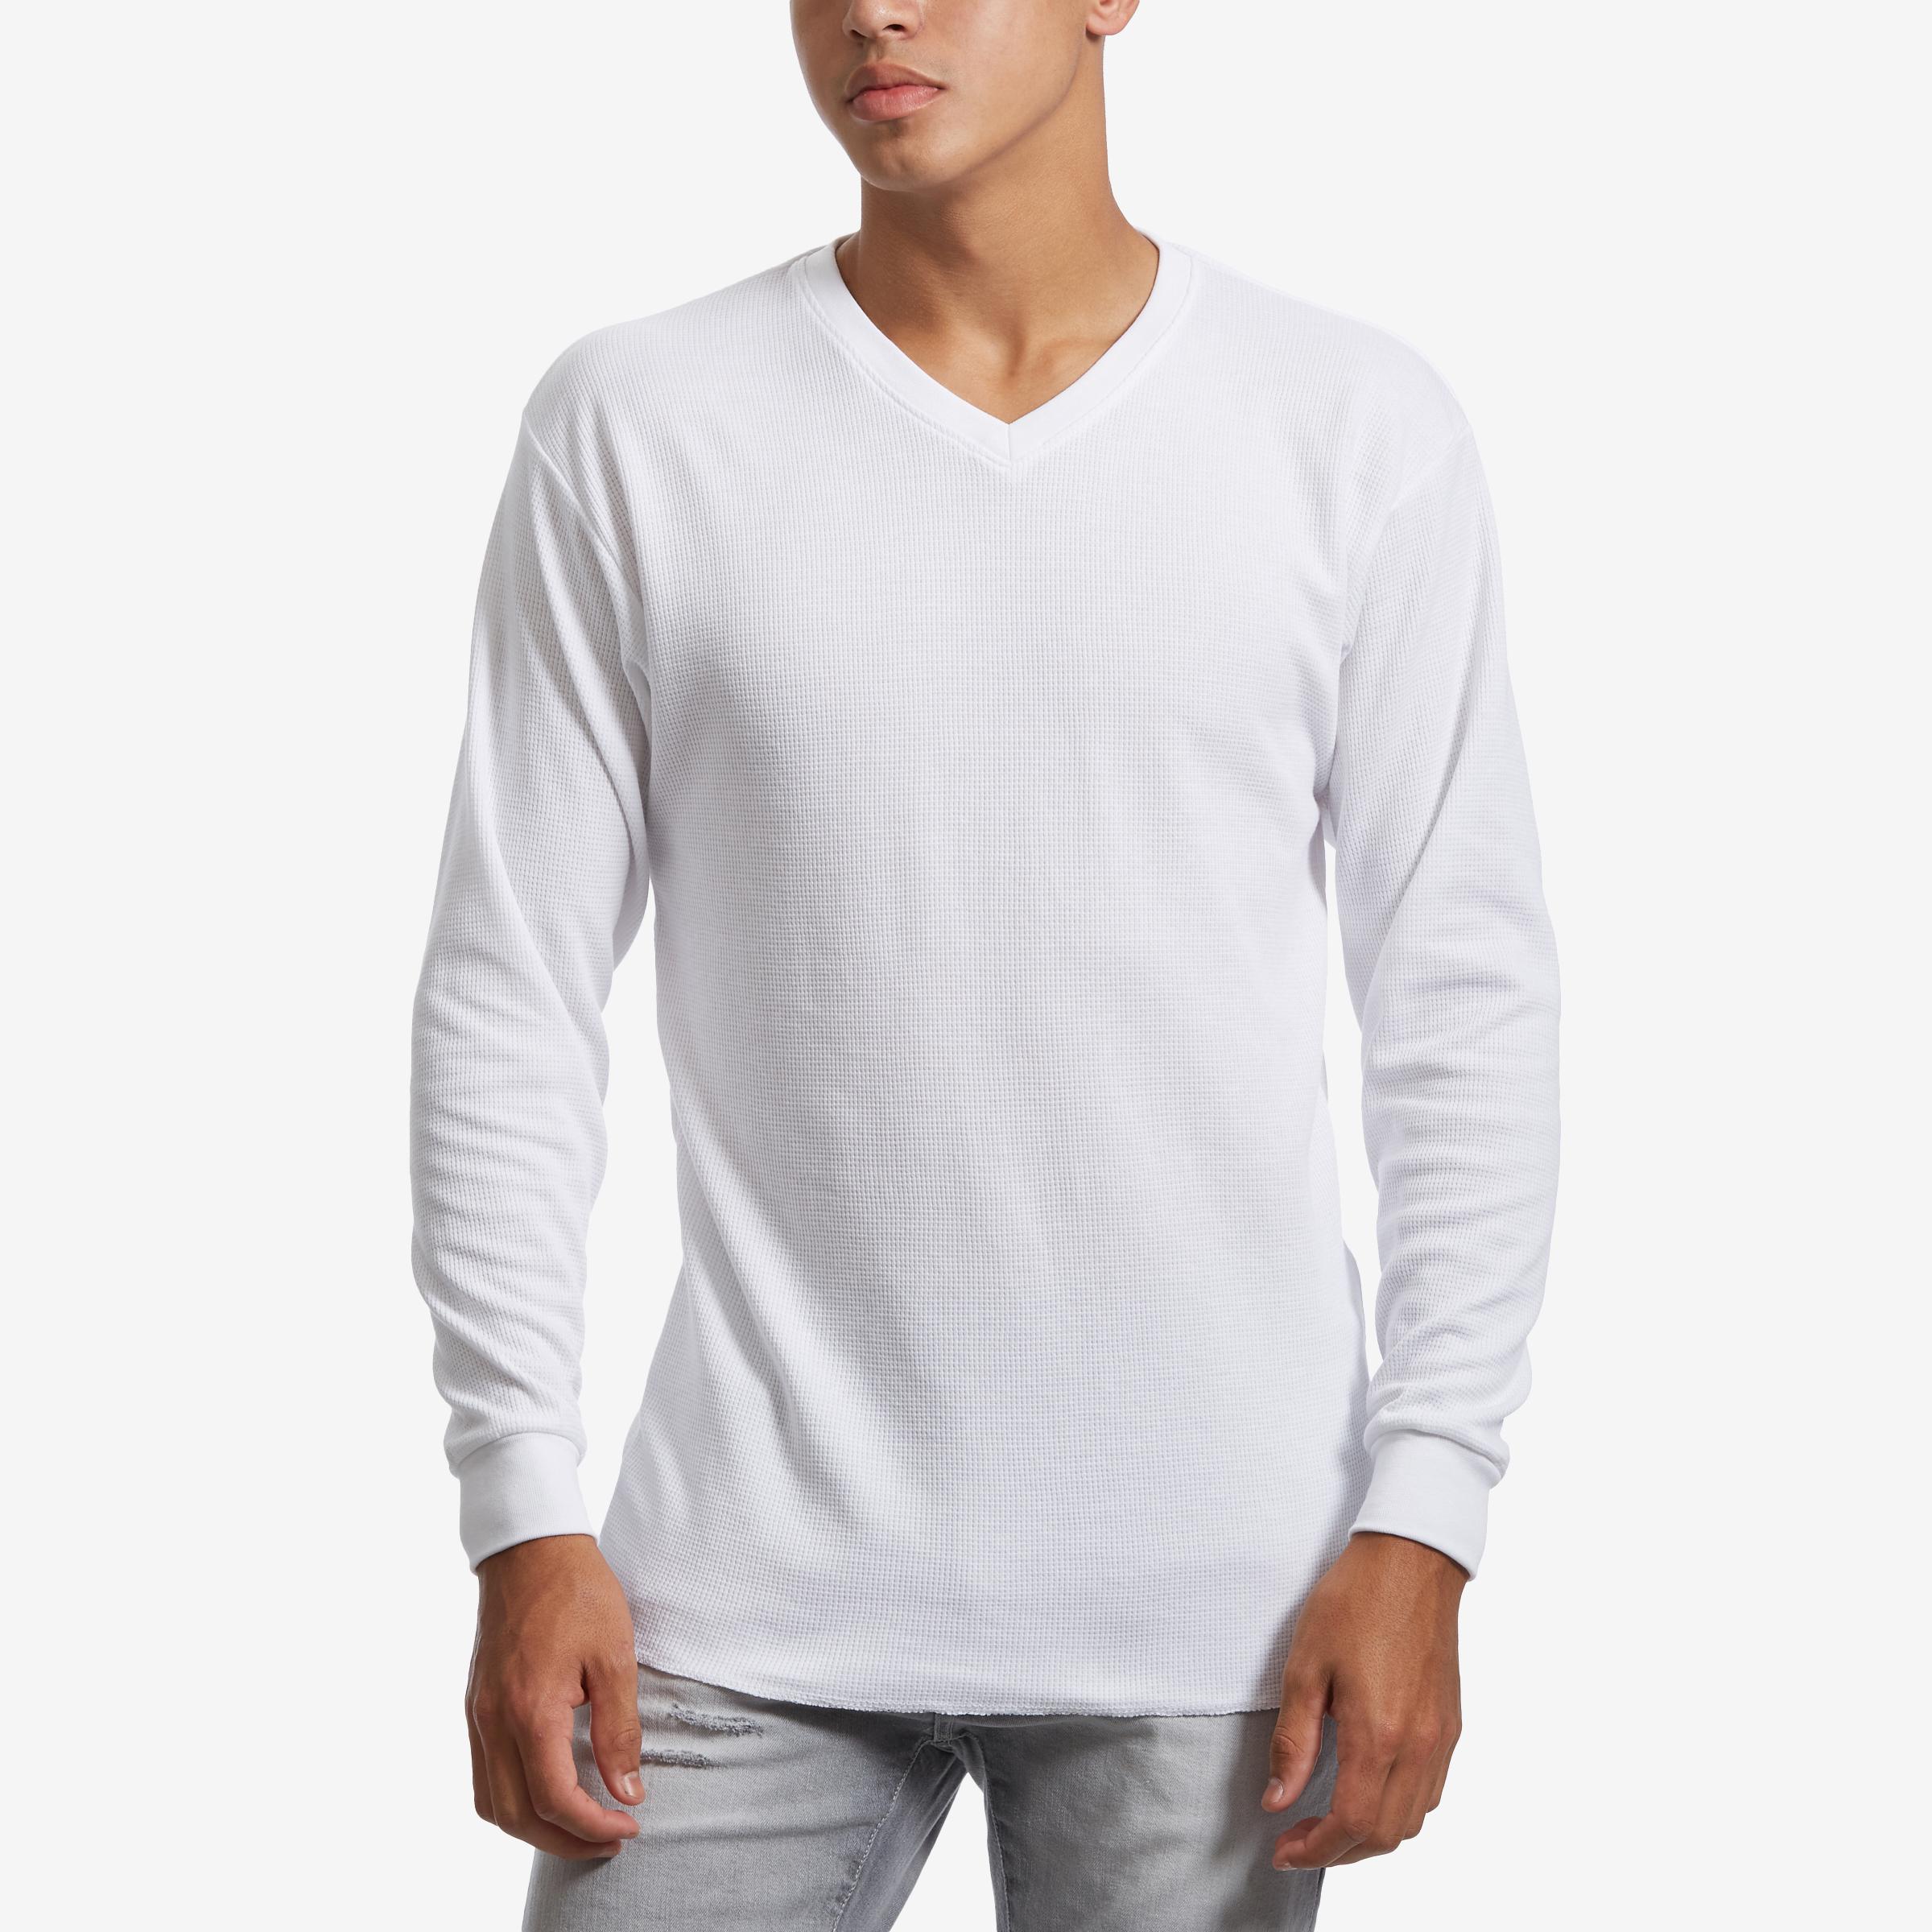 V- Neck Thermal Shirt